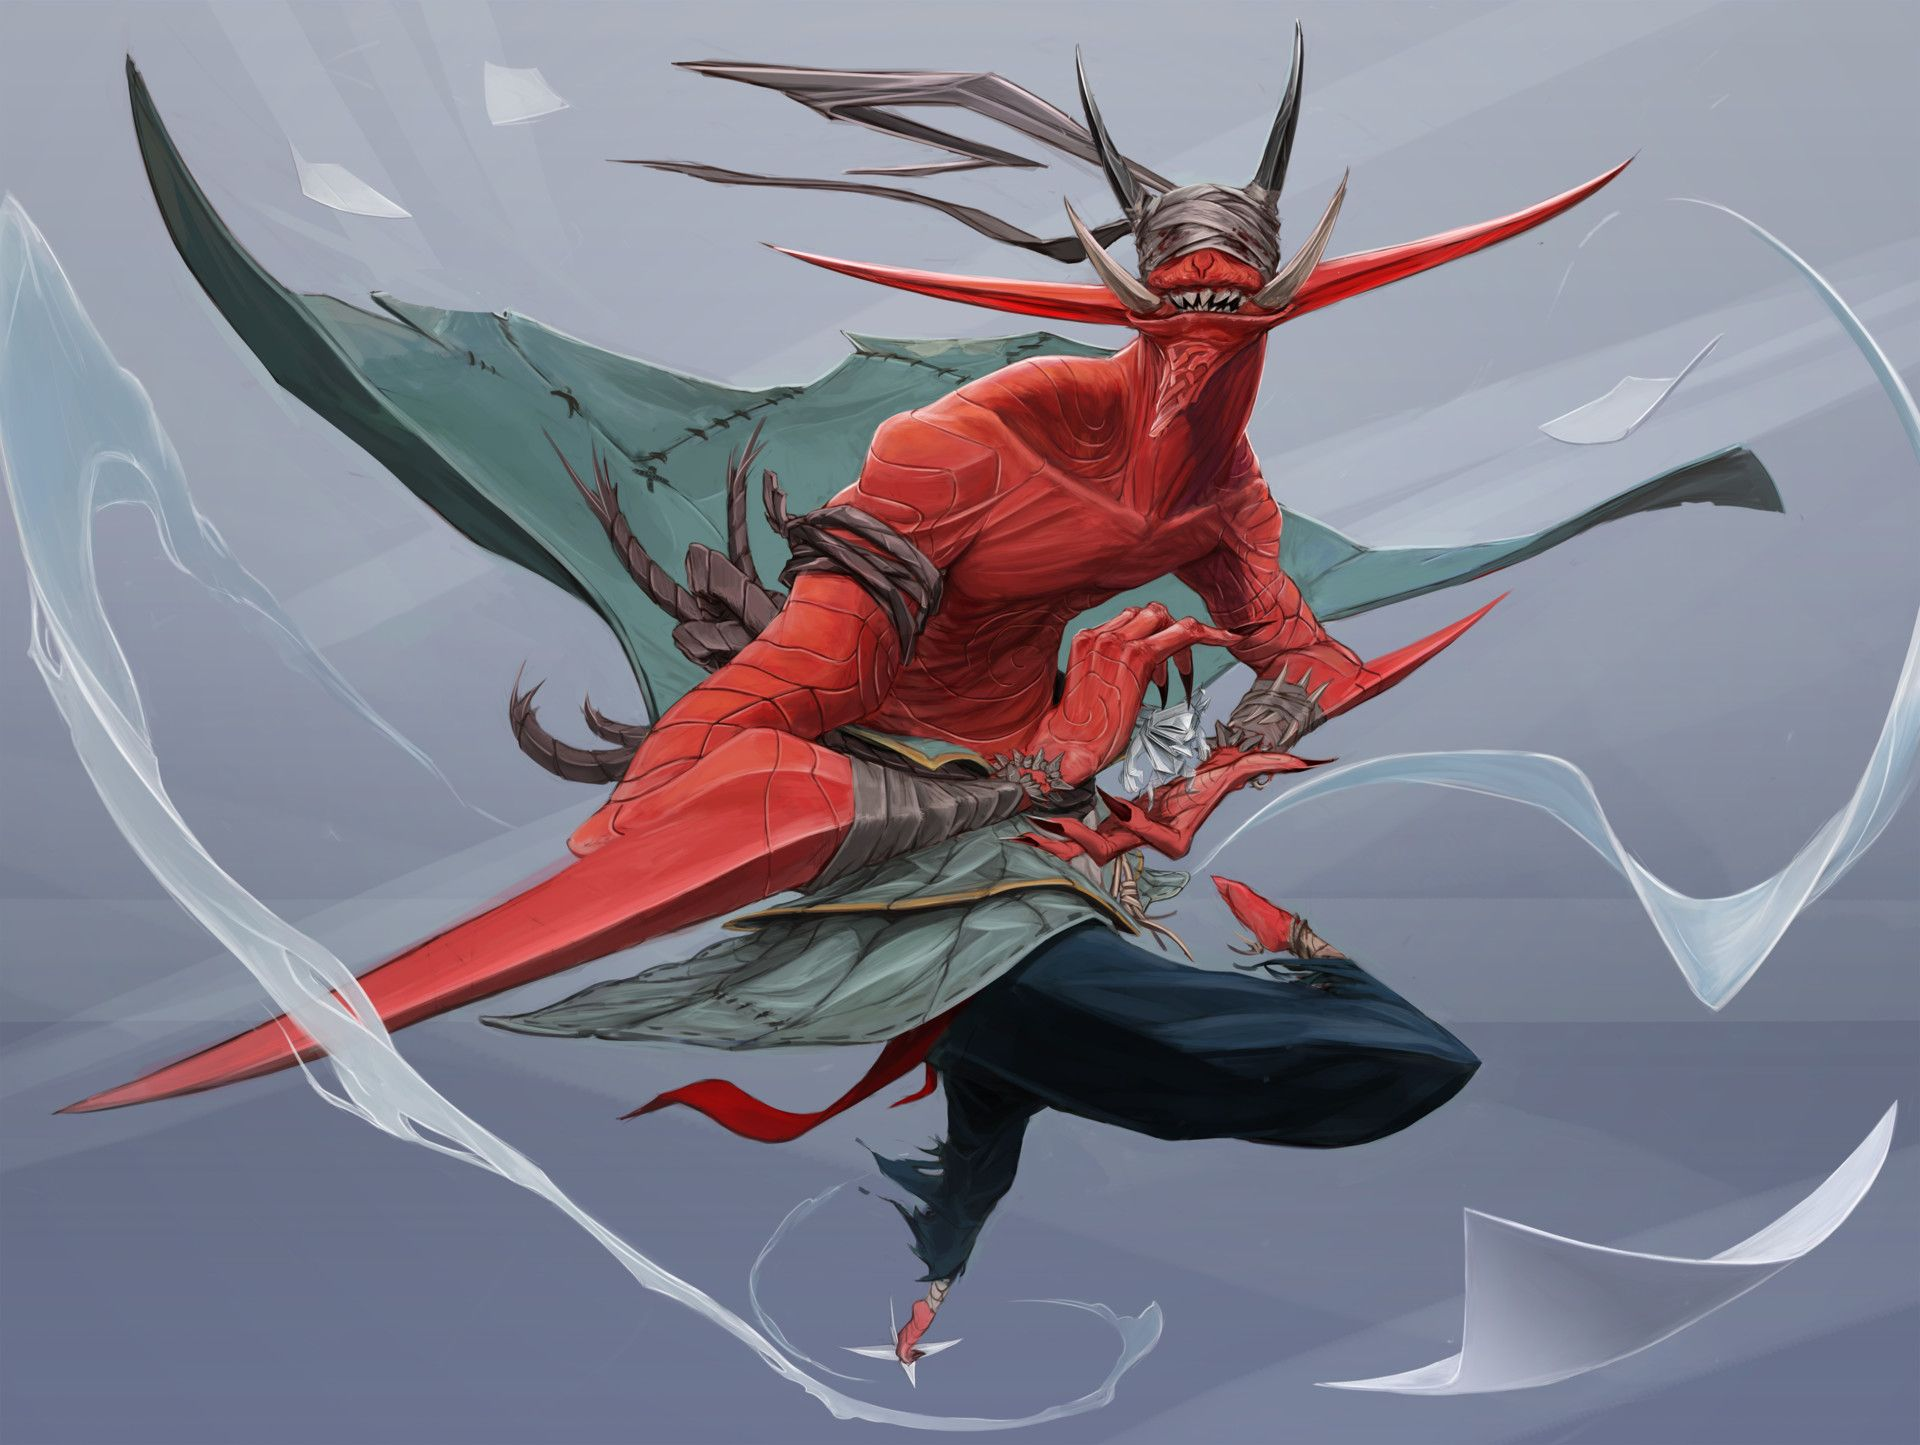 Character Design Challenge Concept : Character design challenge centaurs illustration